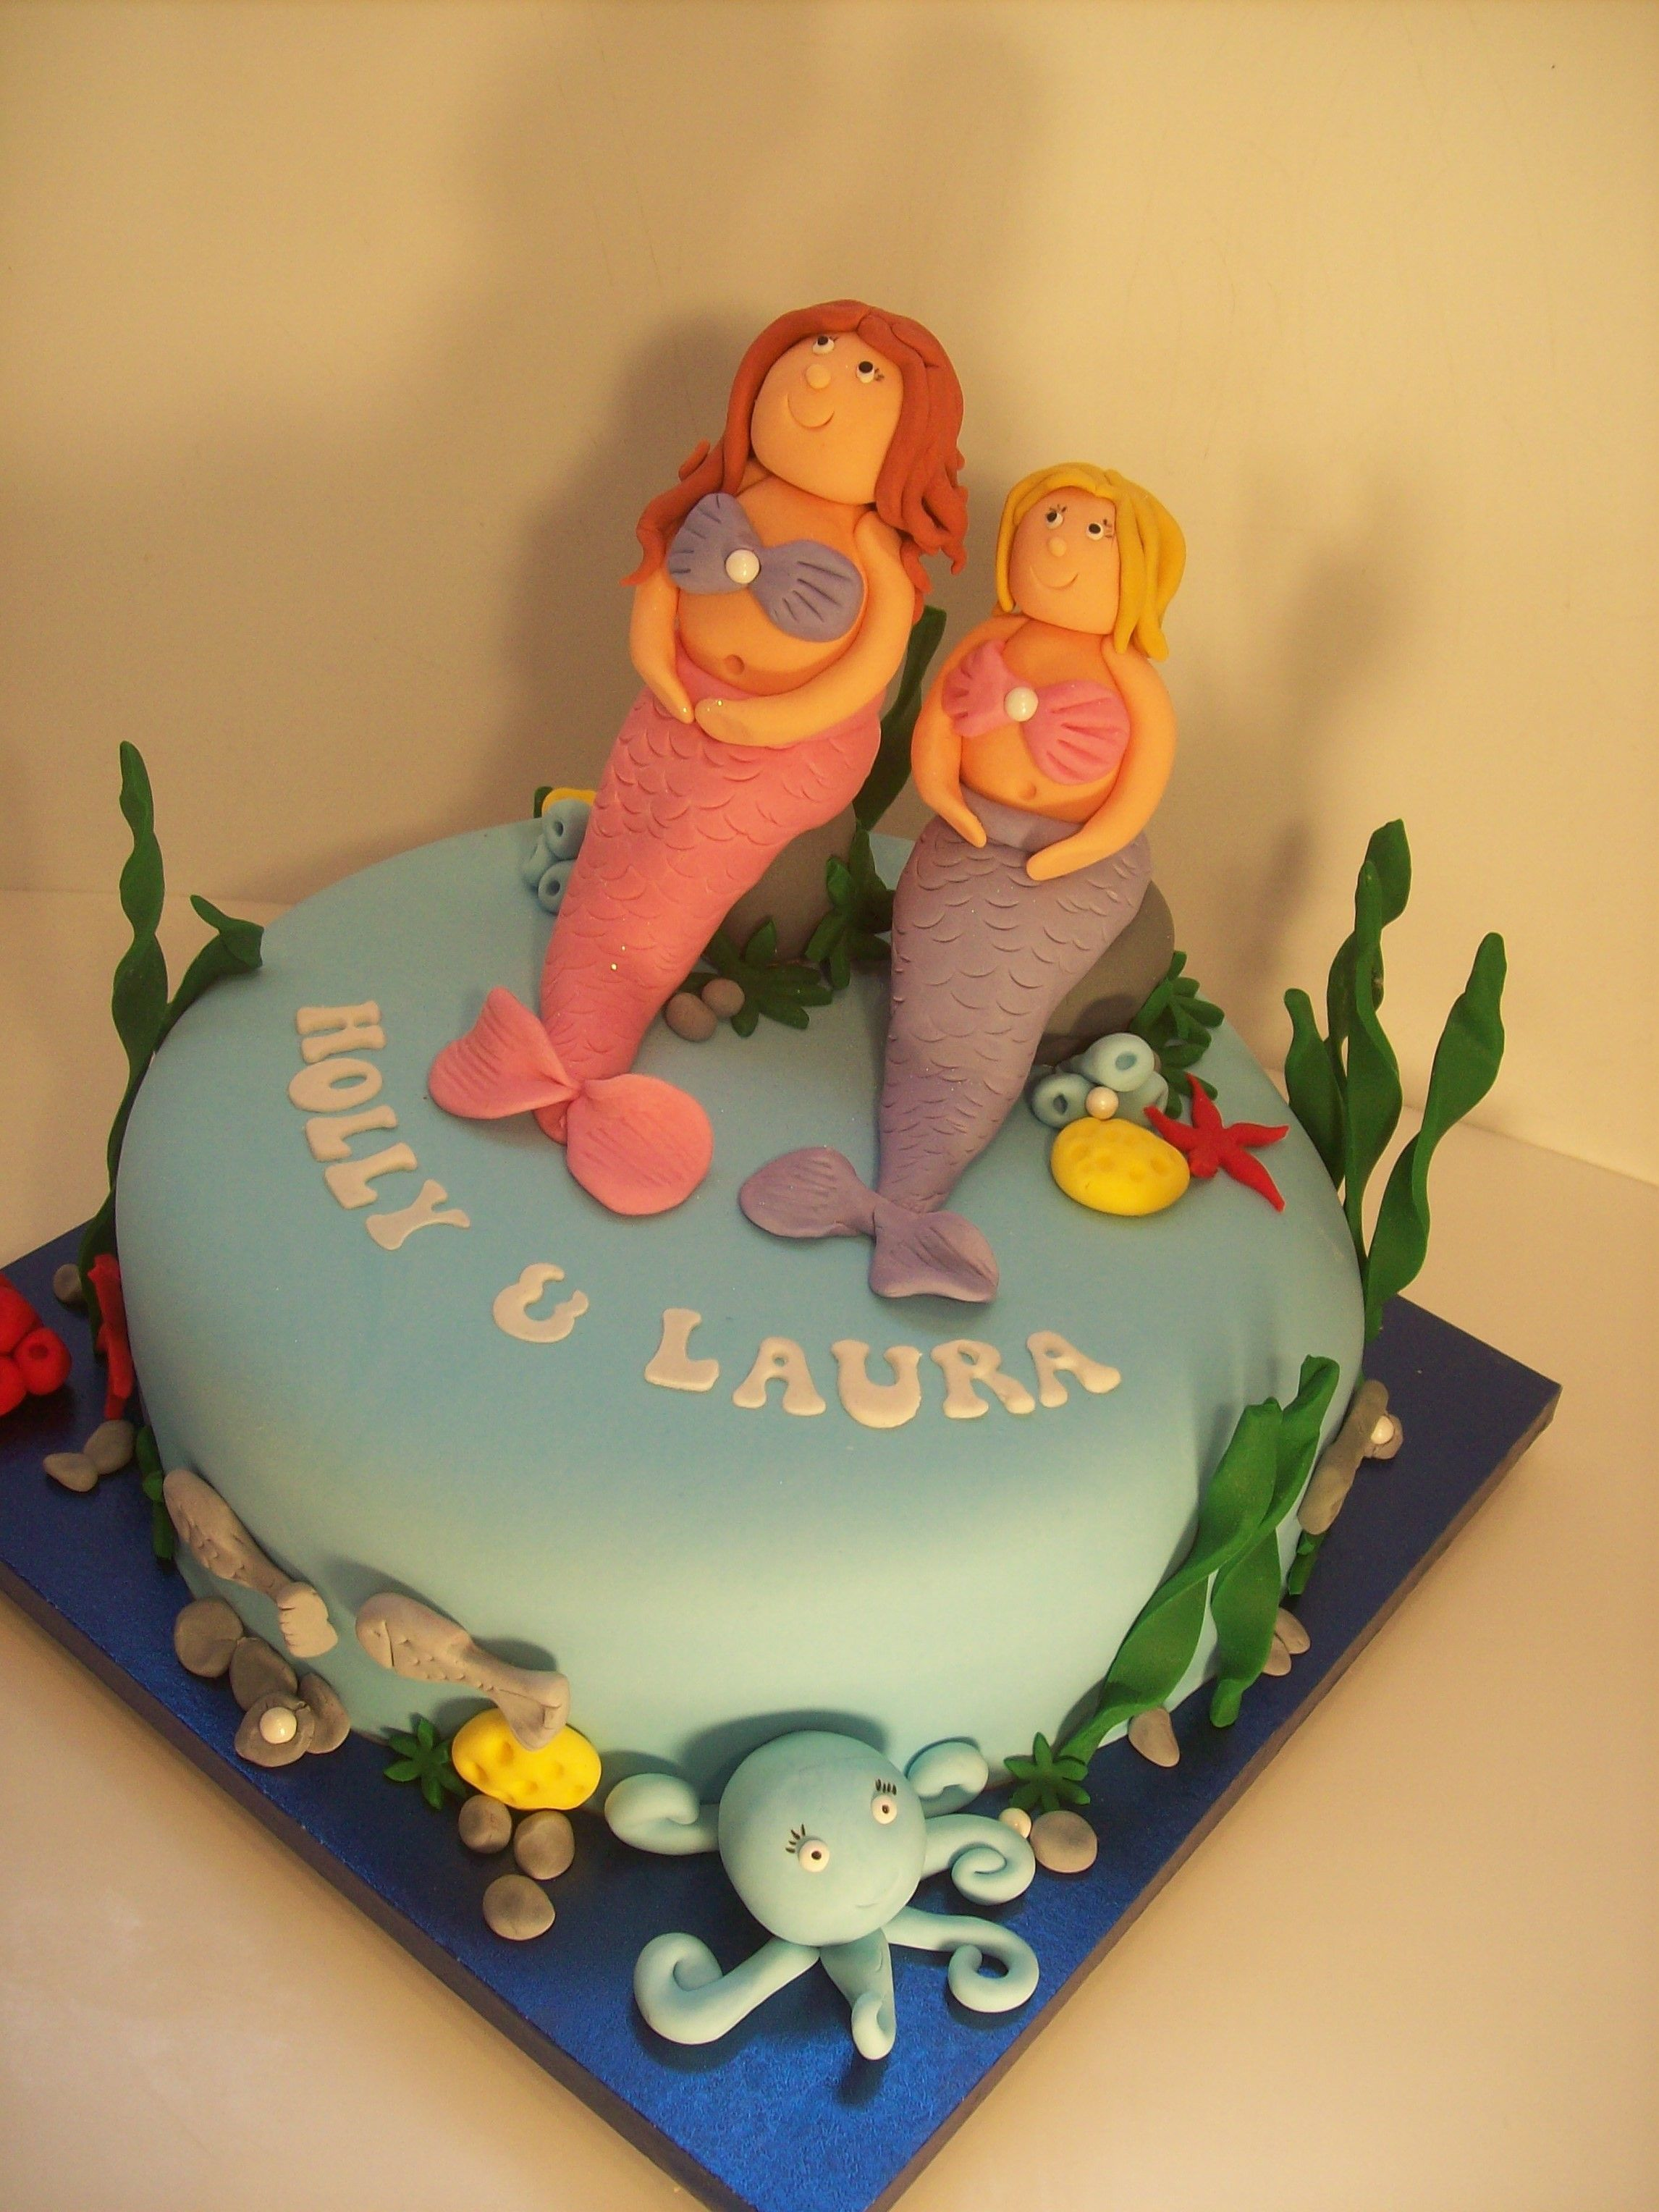 Mermaid Cake Auckland (2014) $195 10 inch Dairy Free Cake Auckland